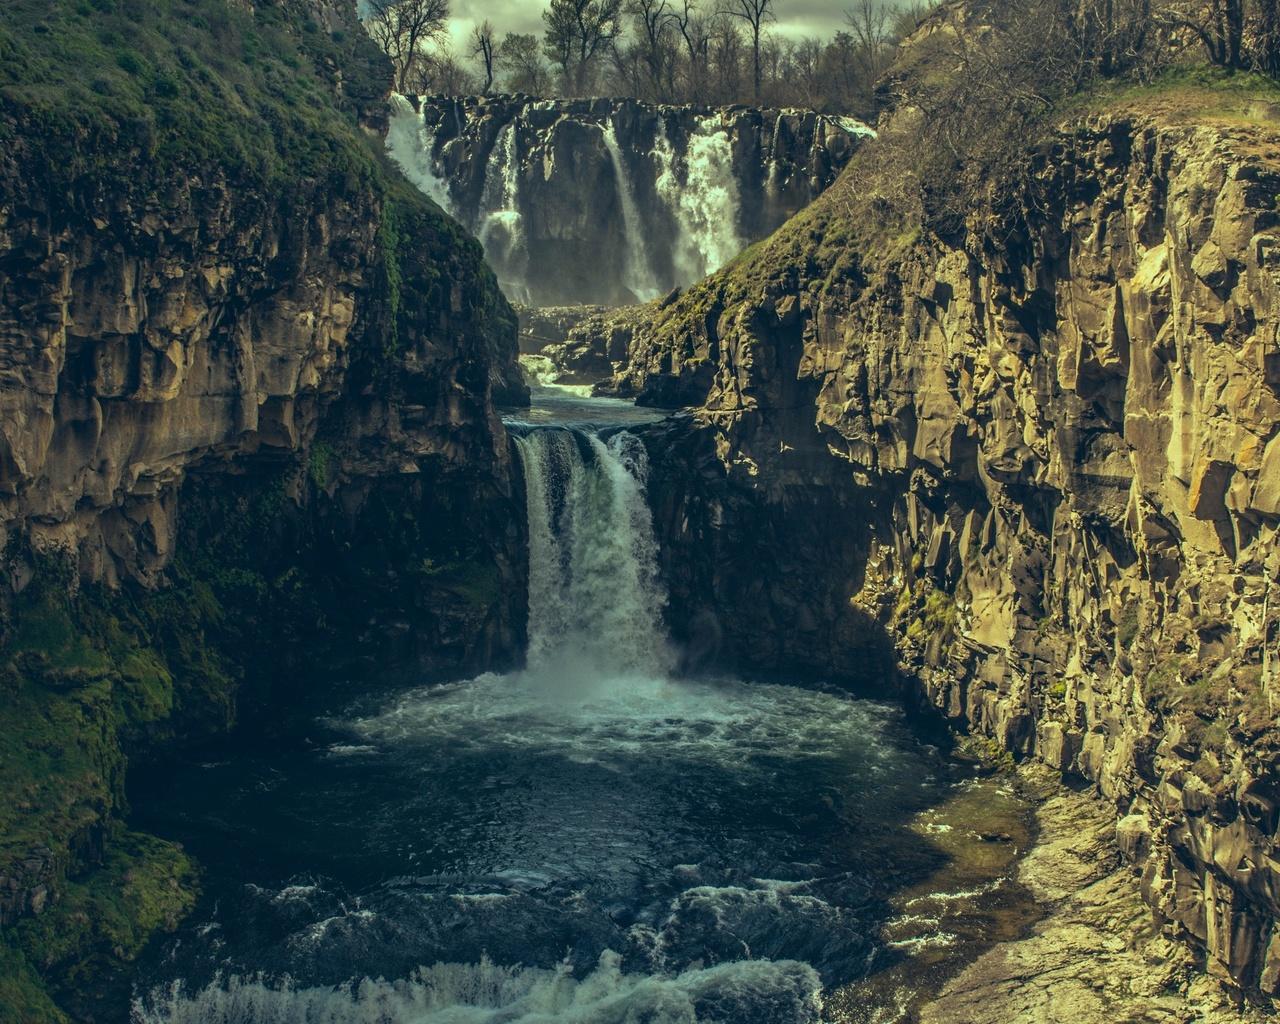 водопад, камни, скала, природа, португалия, утес